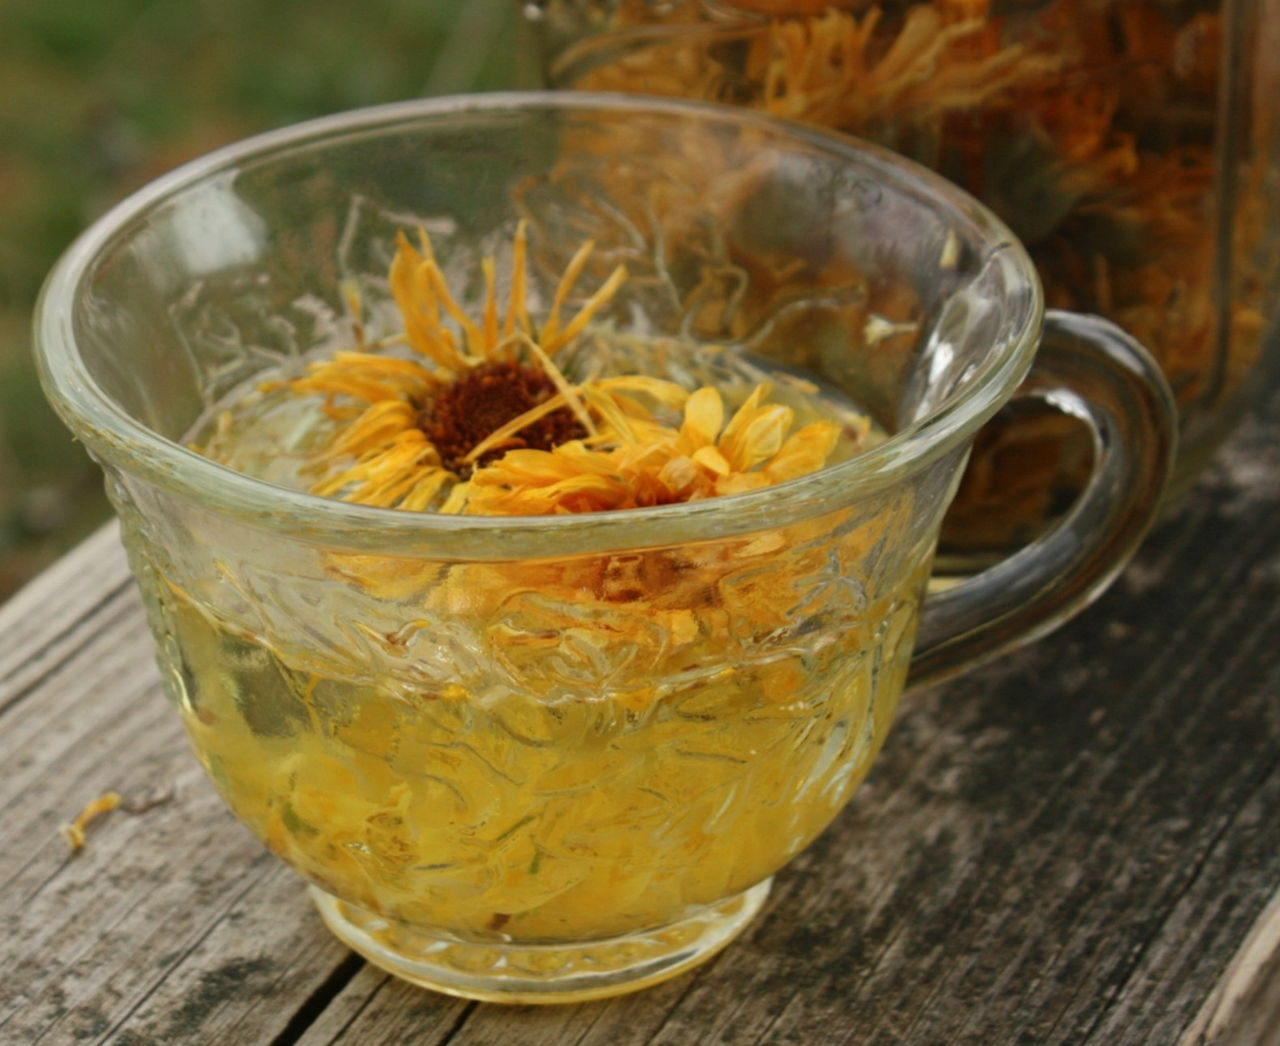 Marigold for tonsilloliths